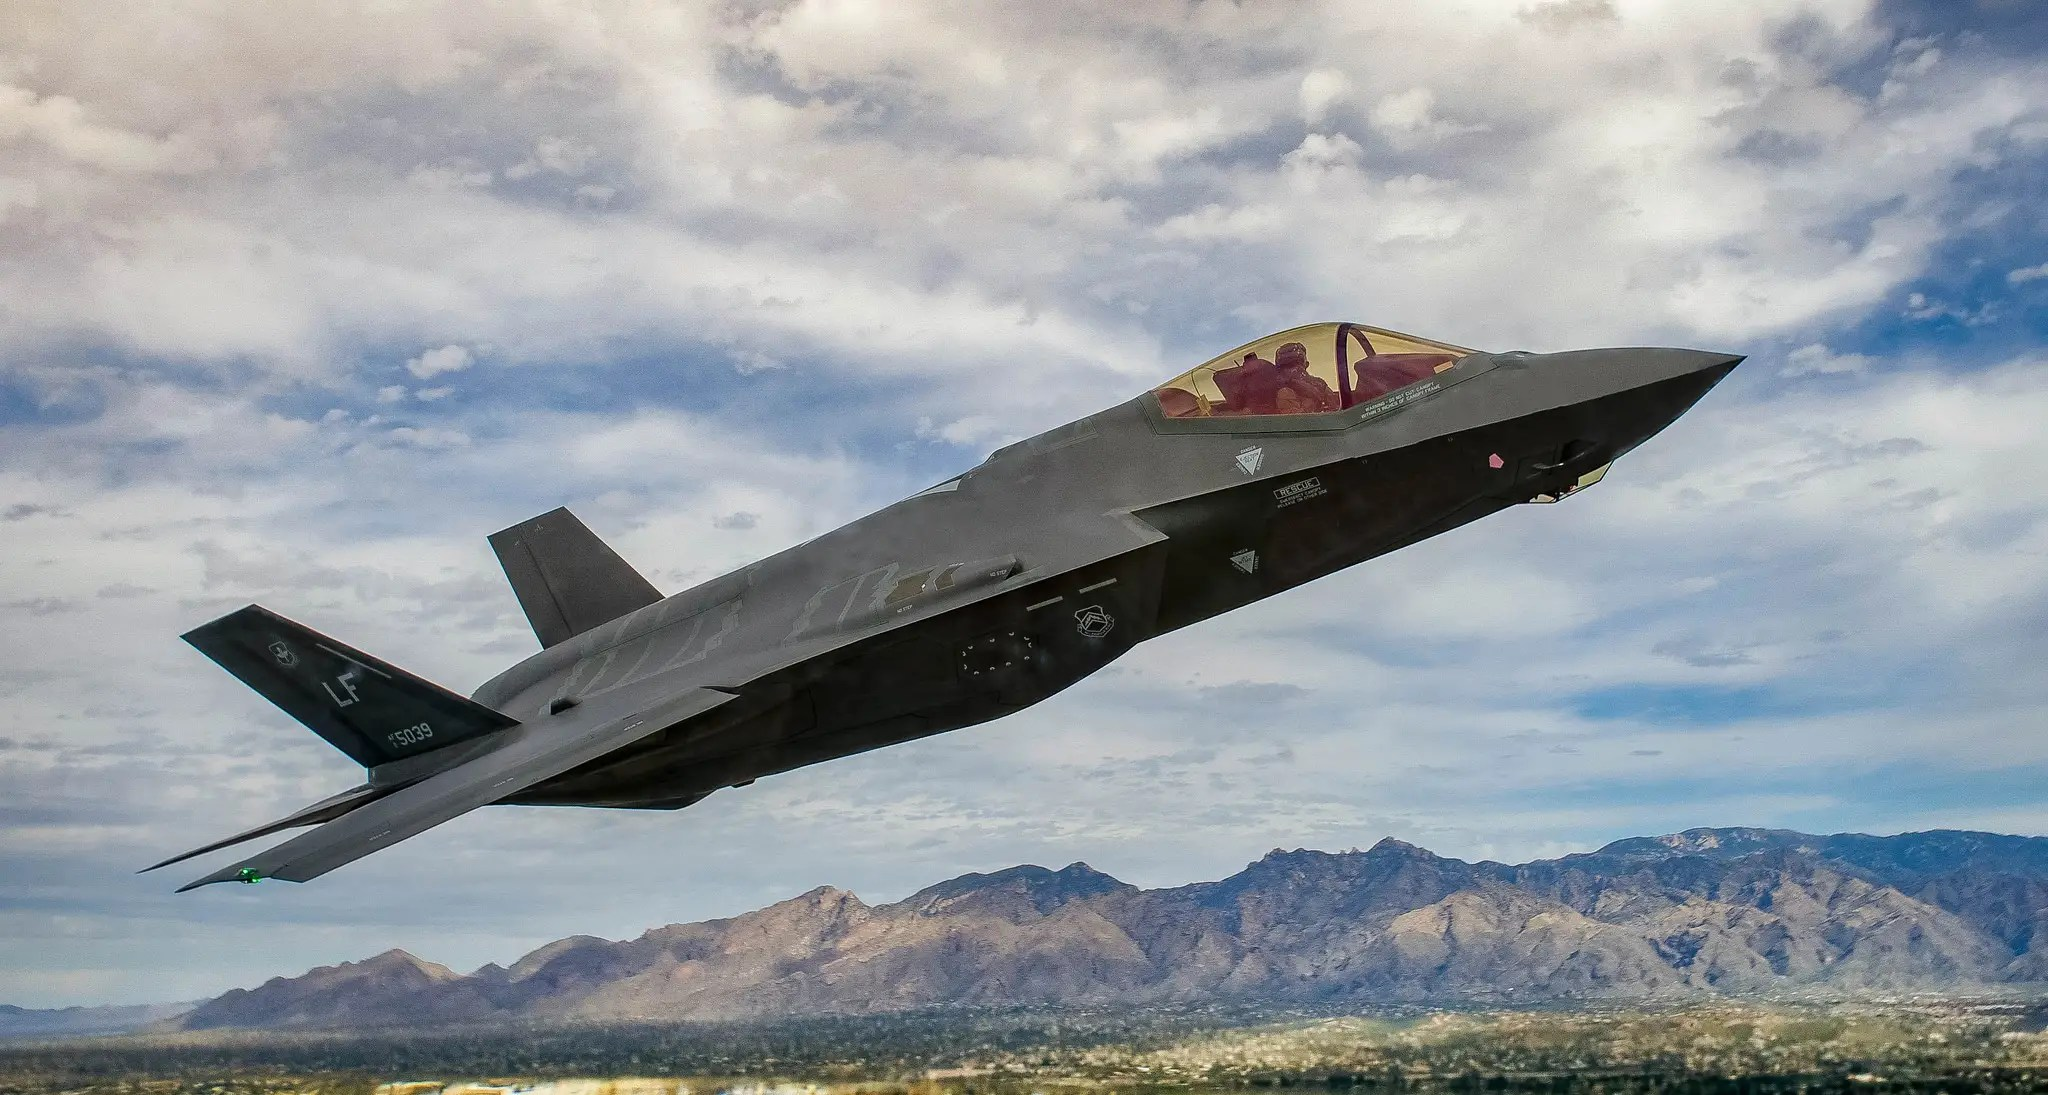 ... the F-35 Lightning II.